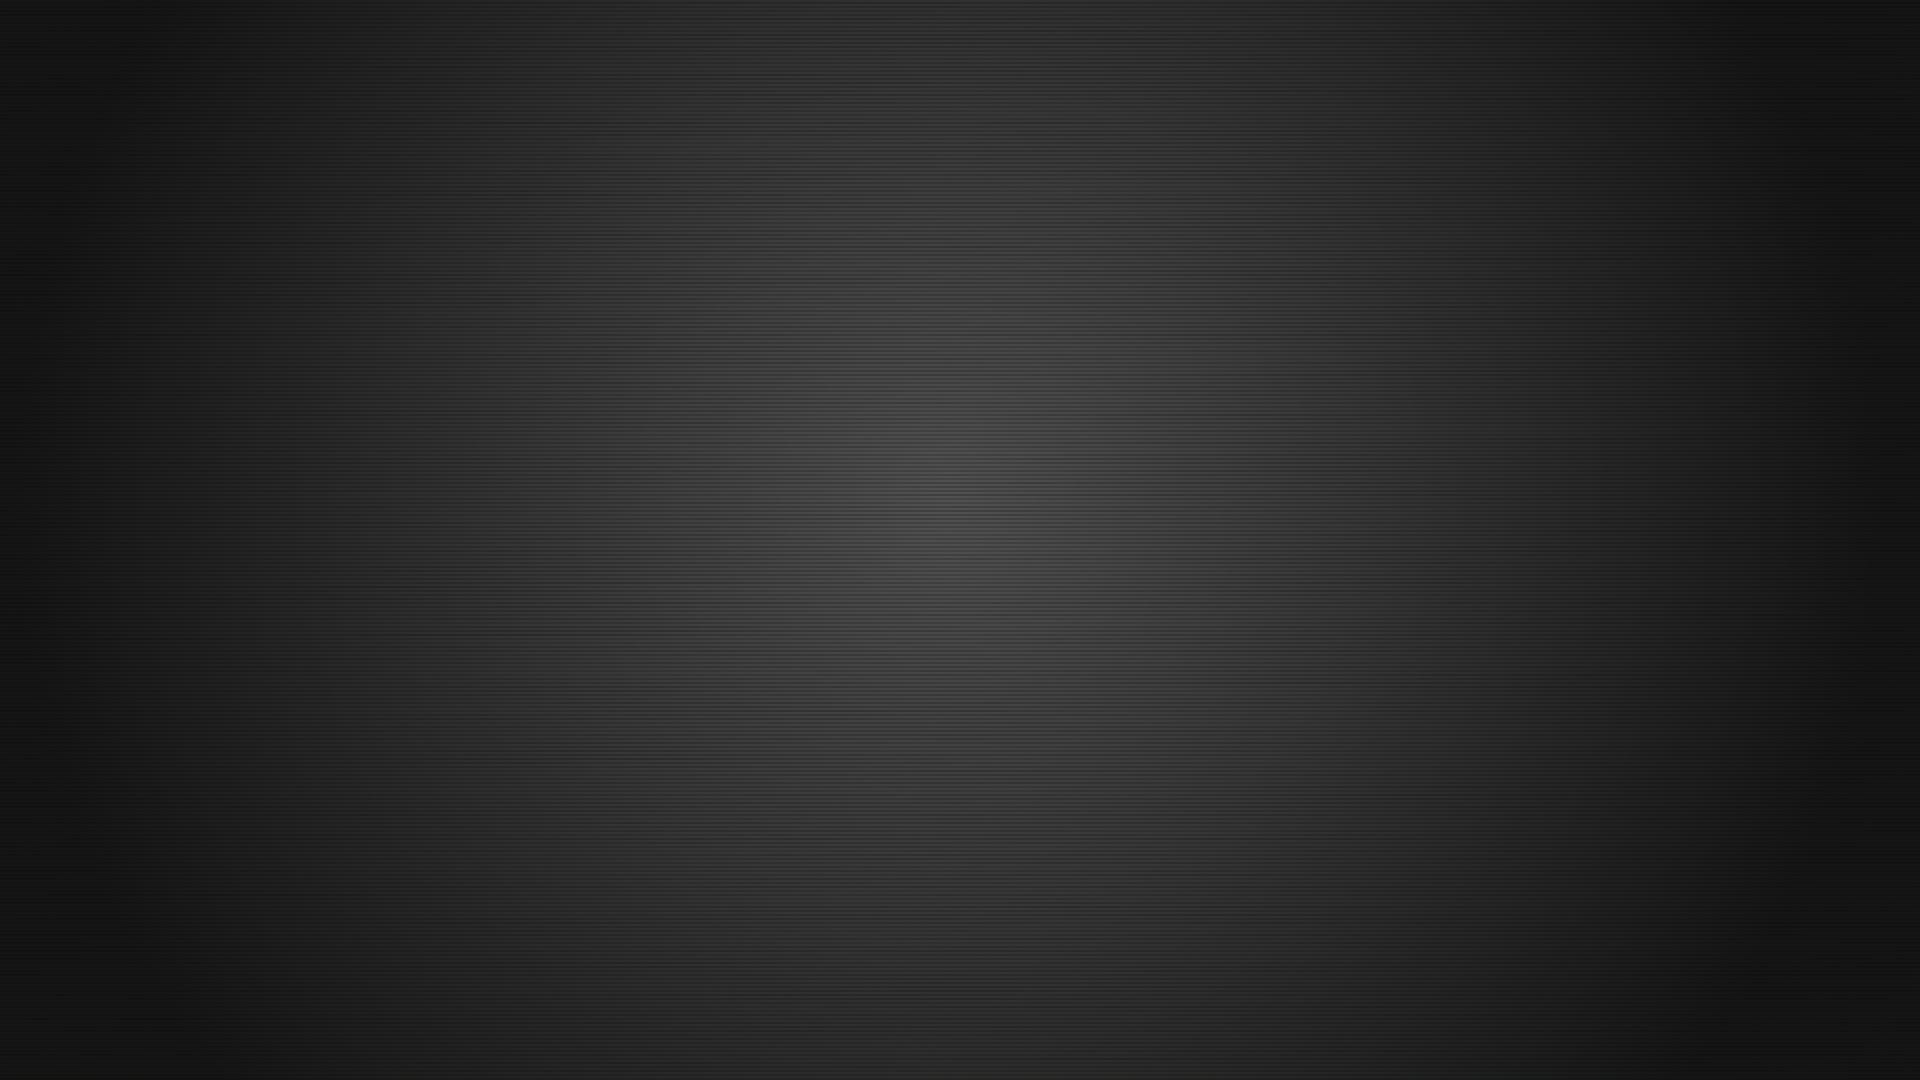 Slider Pozadine IMPERIJA, crne boje